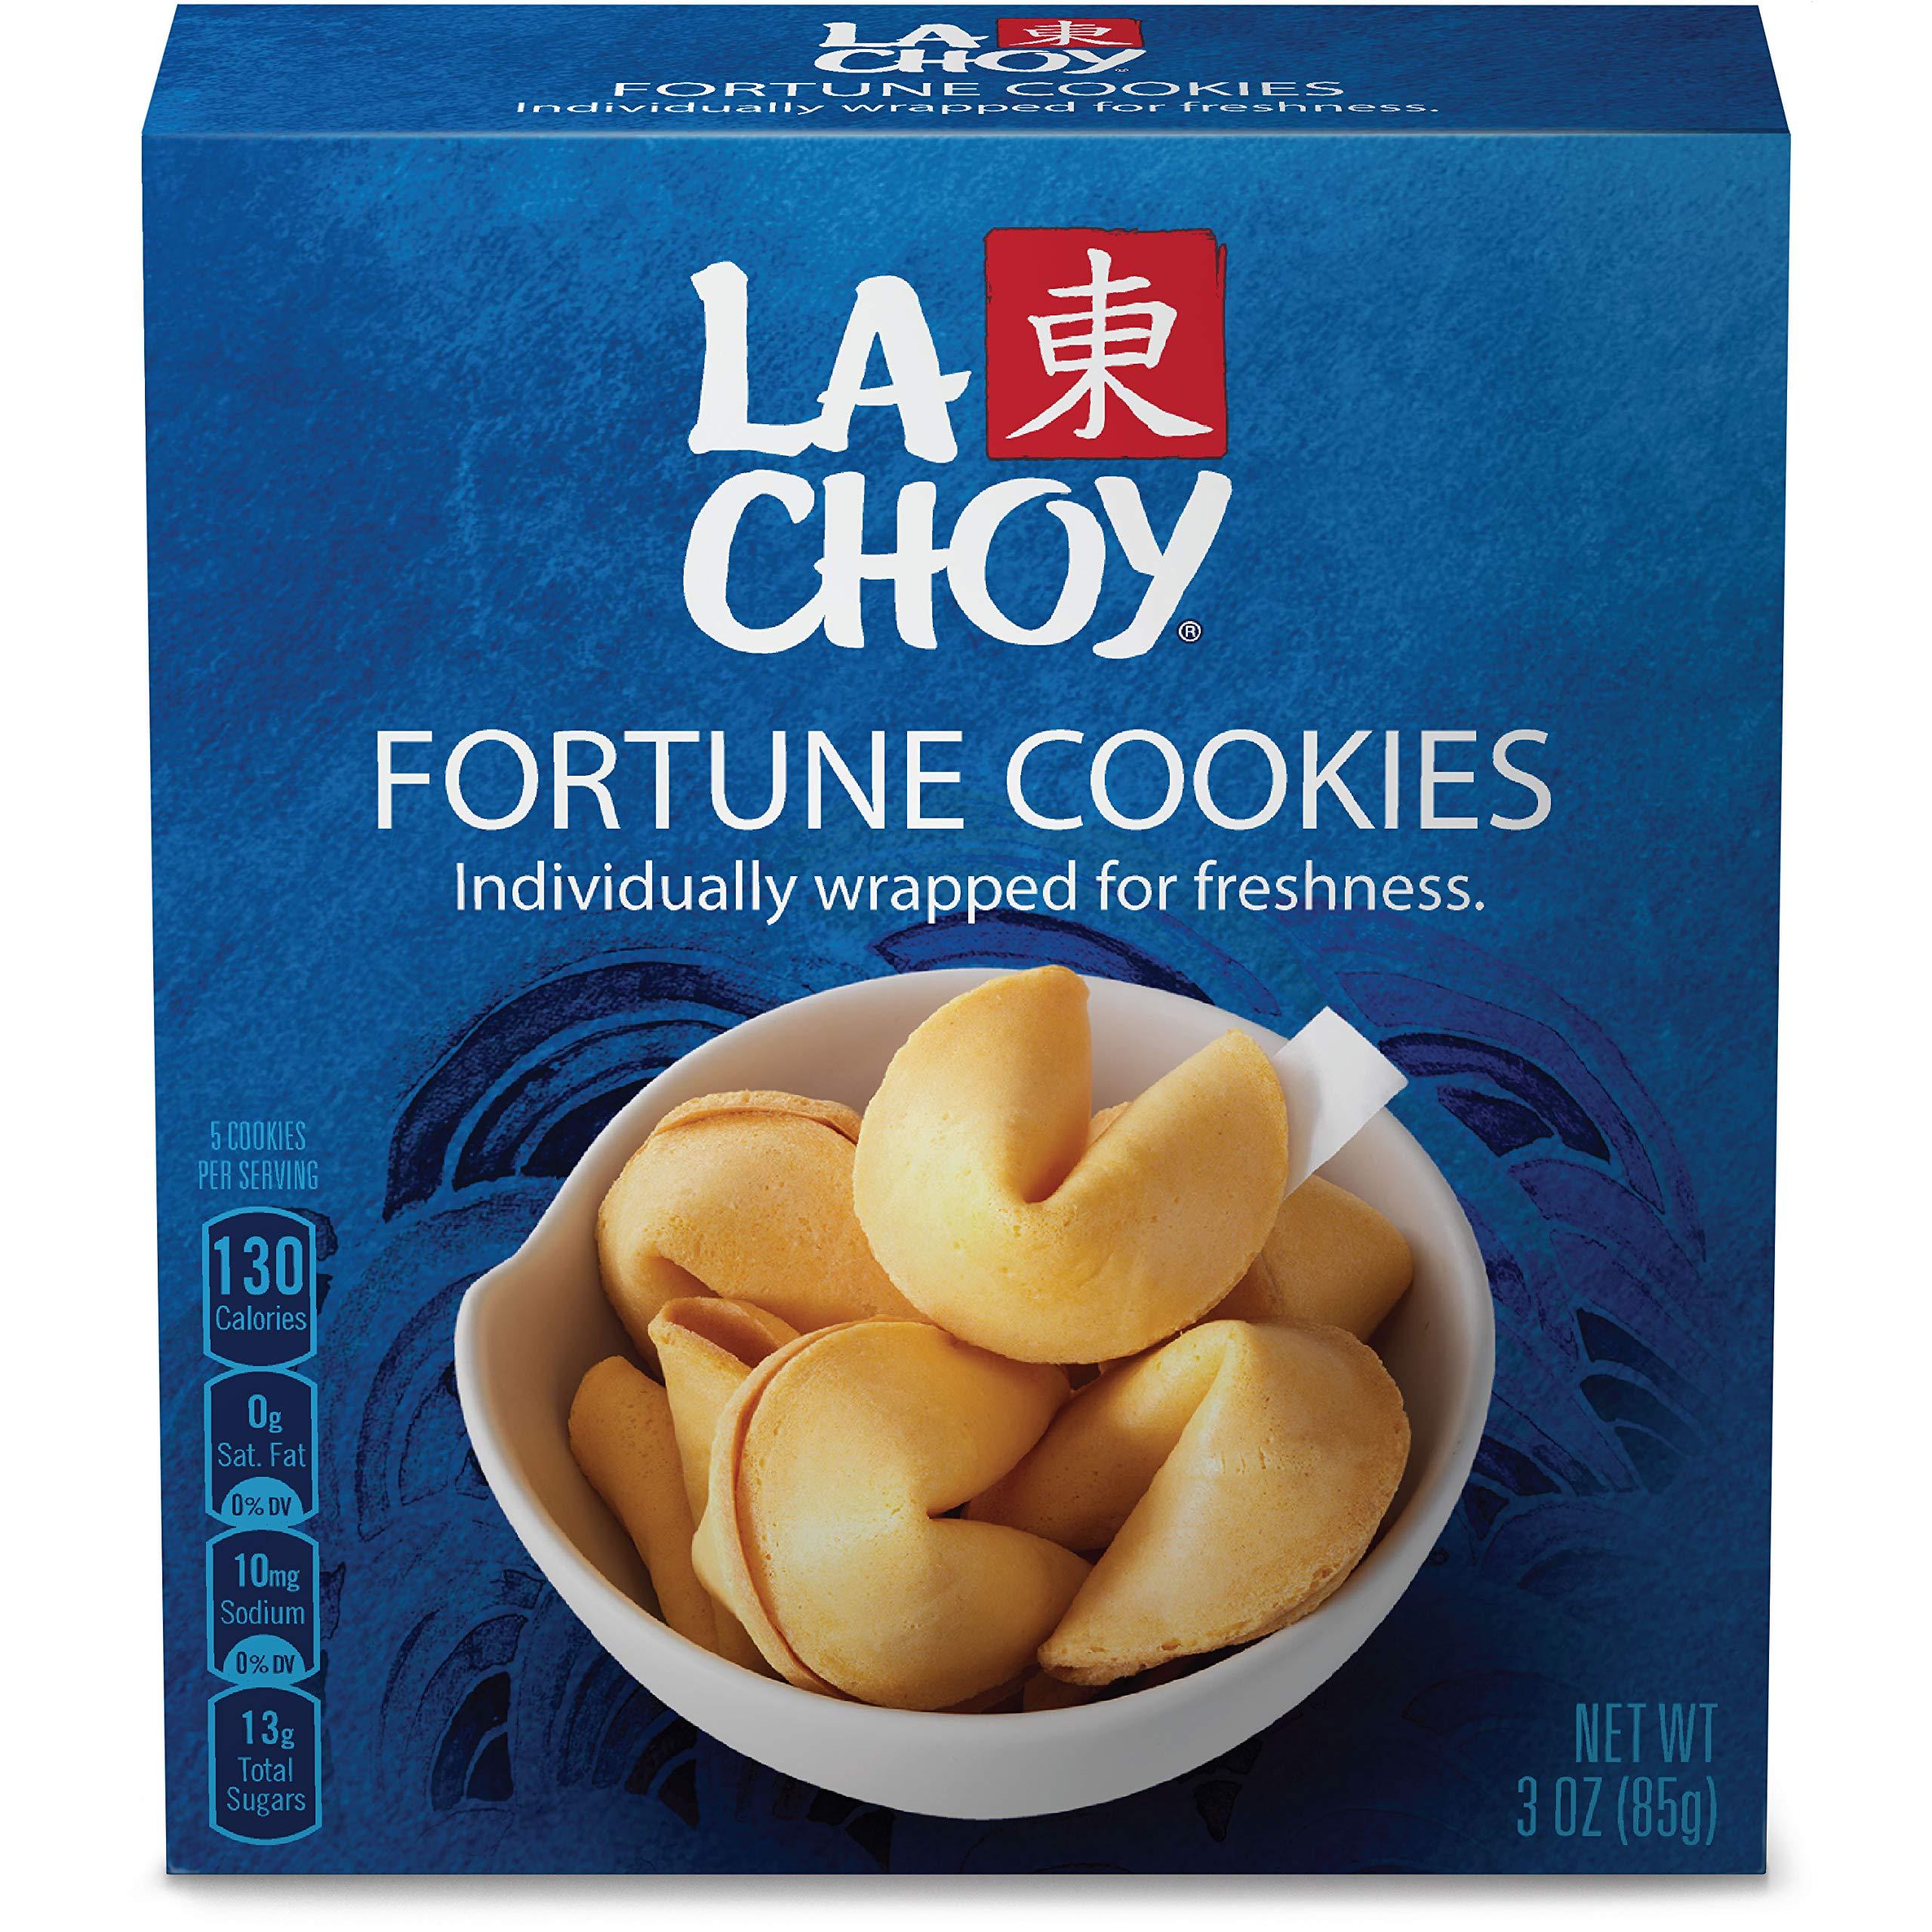 La Choy Fortune Cookies, 3 oz, 12 Pack